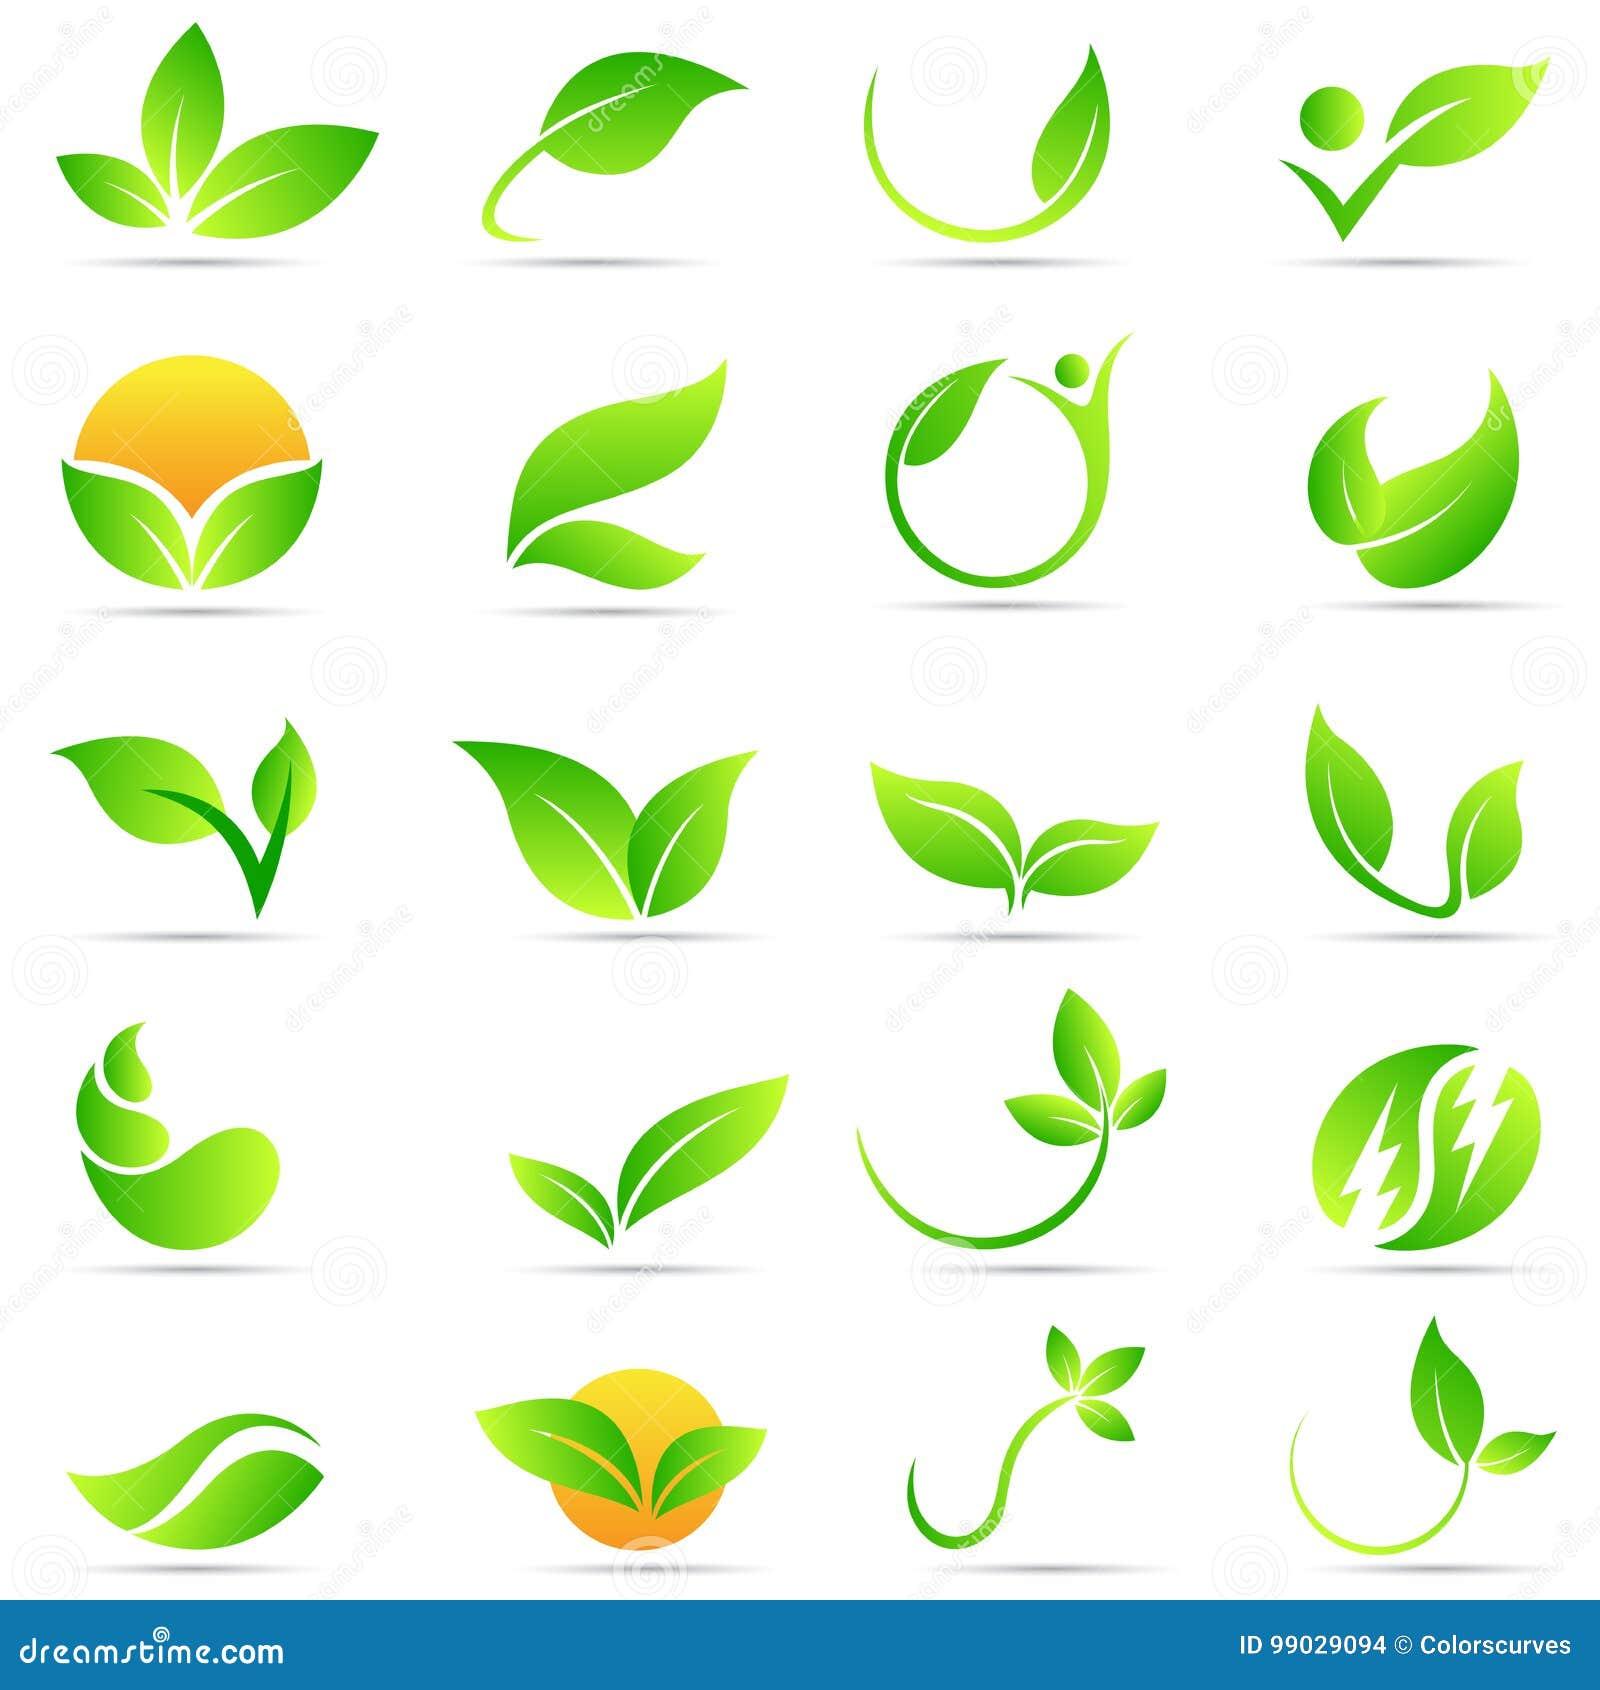 Leaf plant logo wellness nature ecology symbol vector icon design.